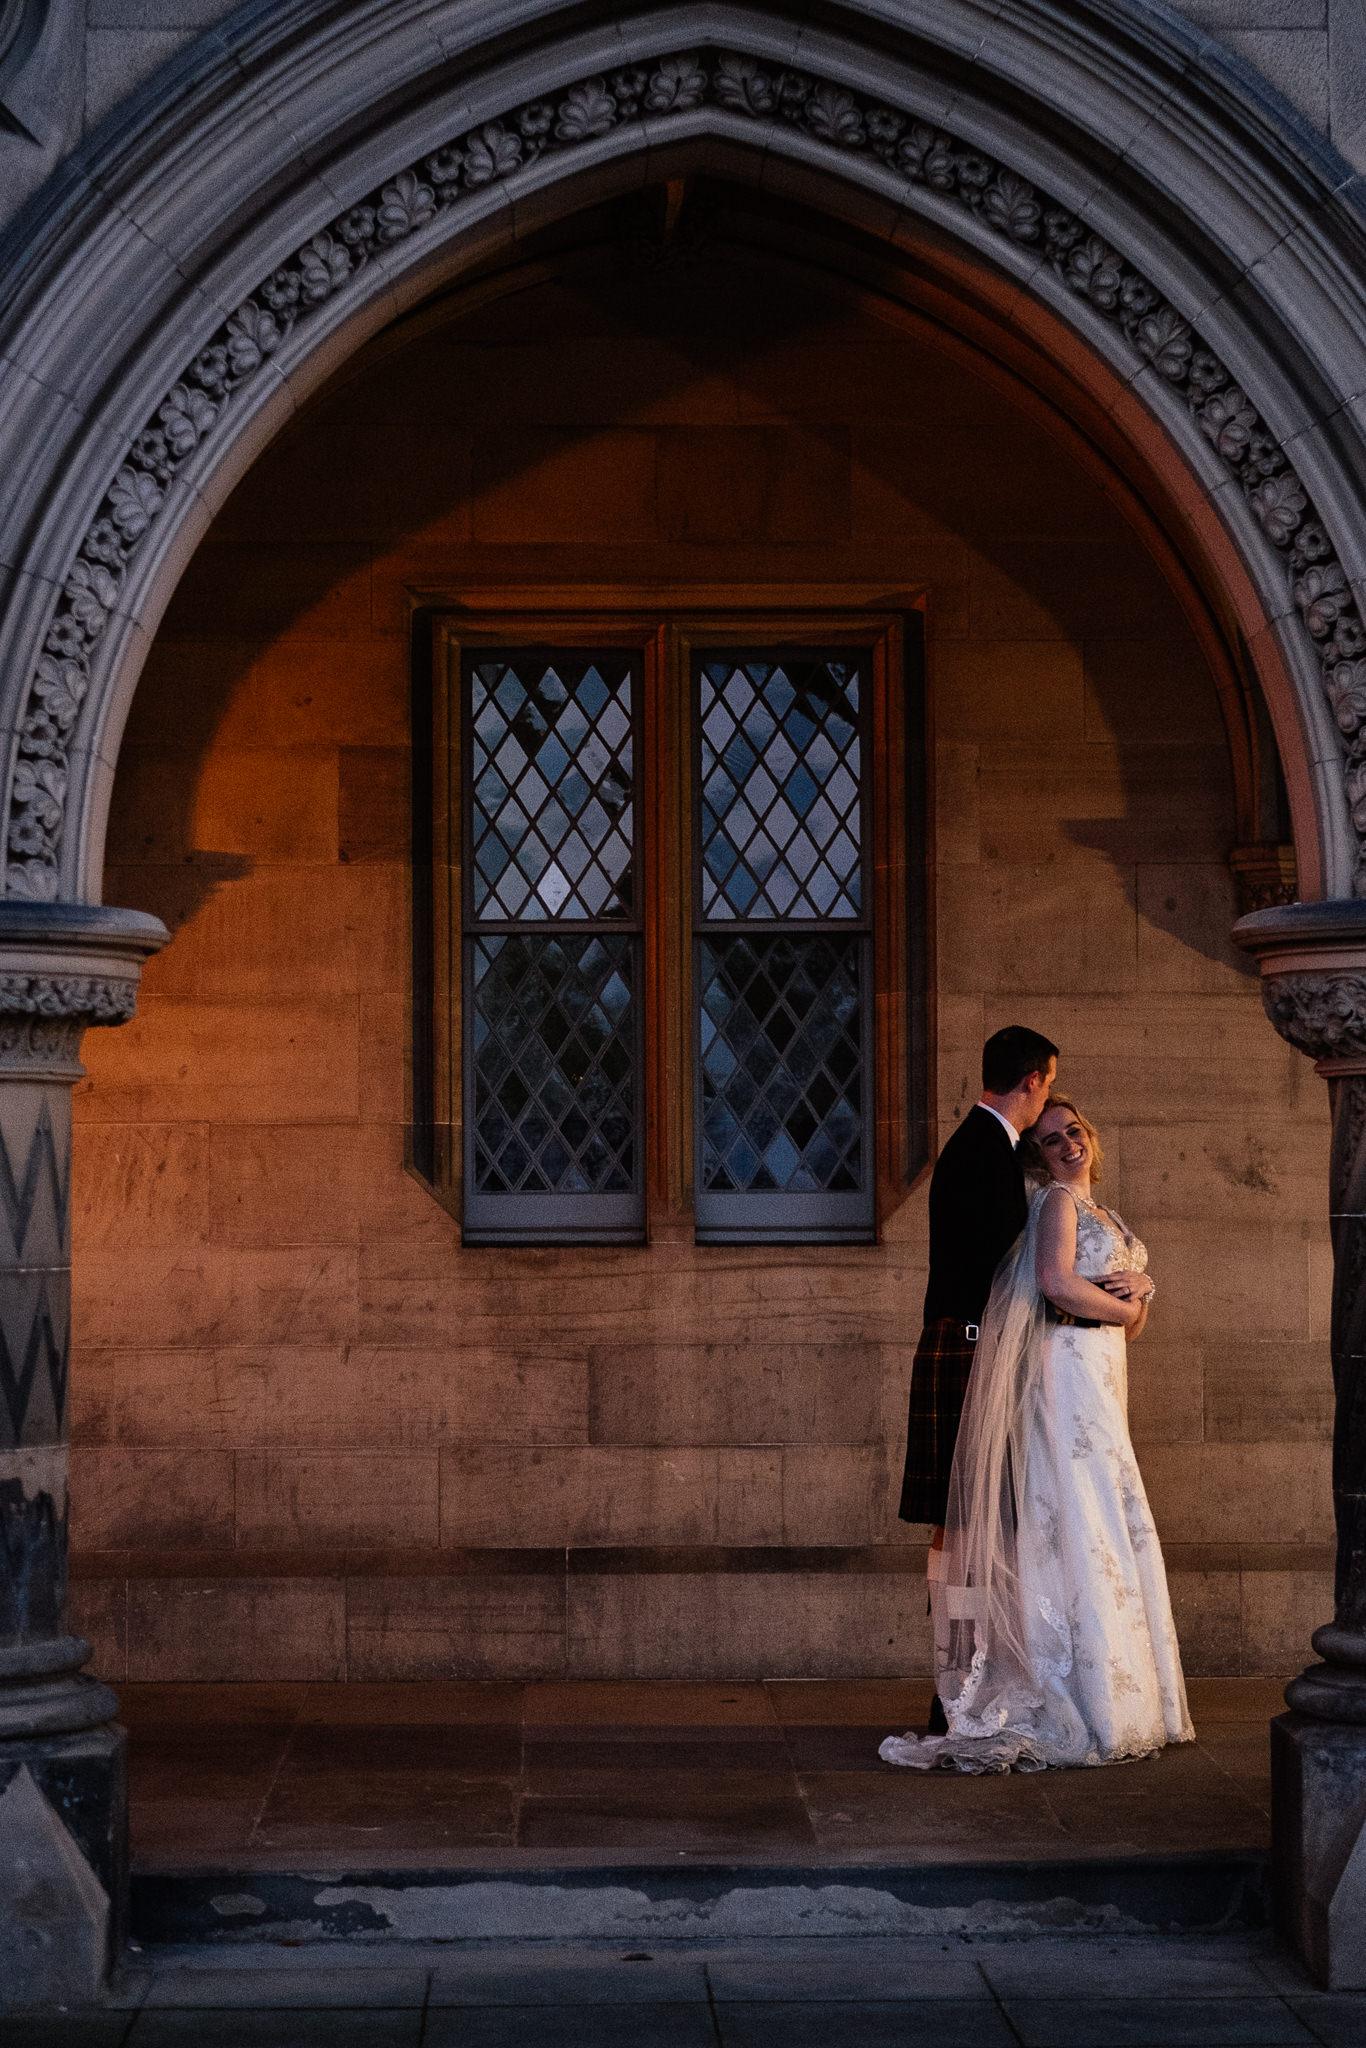 Edinburgh Wedding Photographer_Euan Robertson Photography_016.jpg